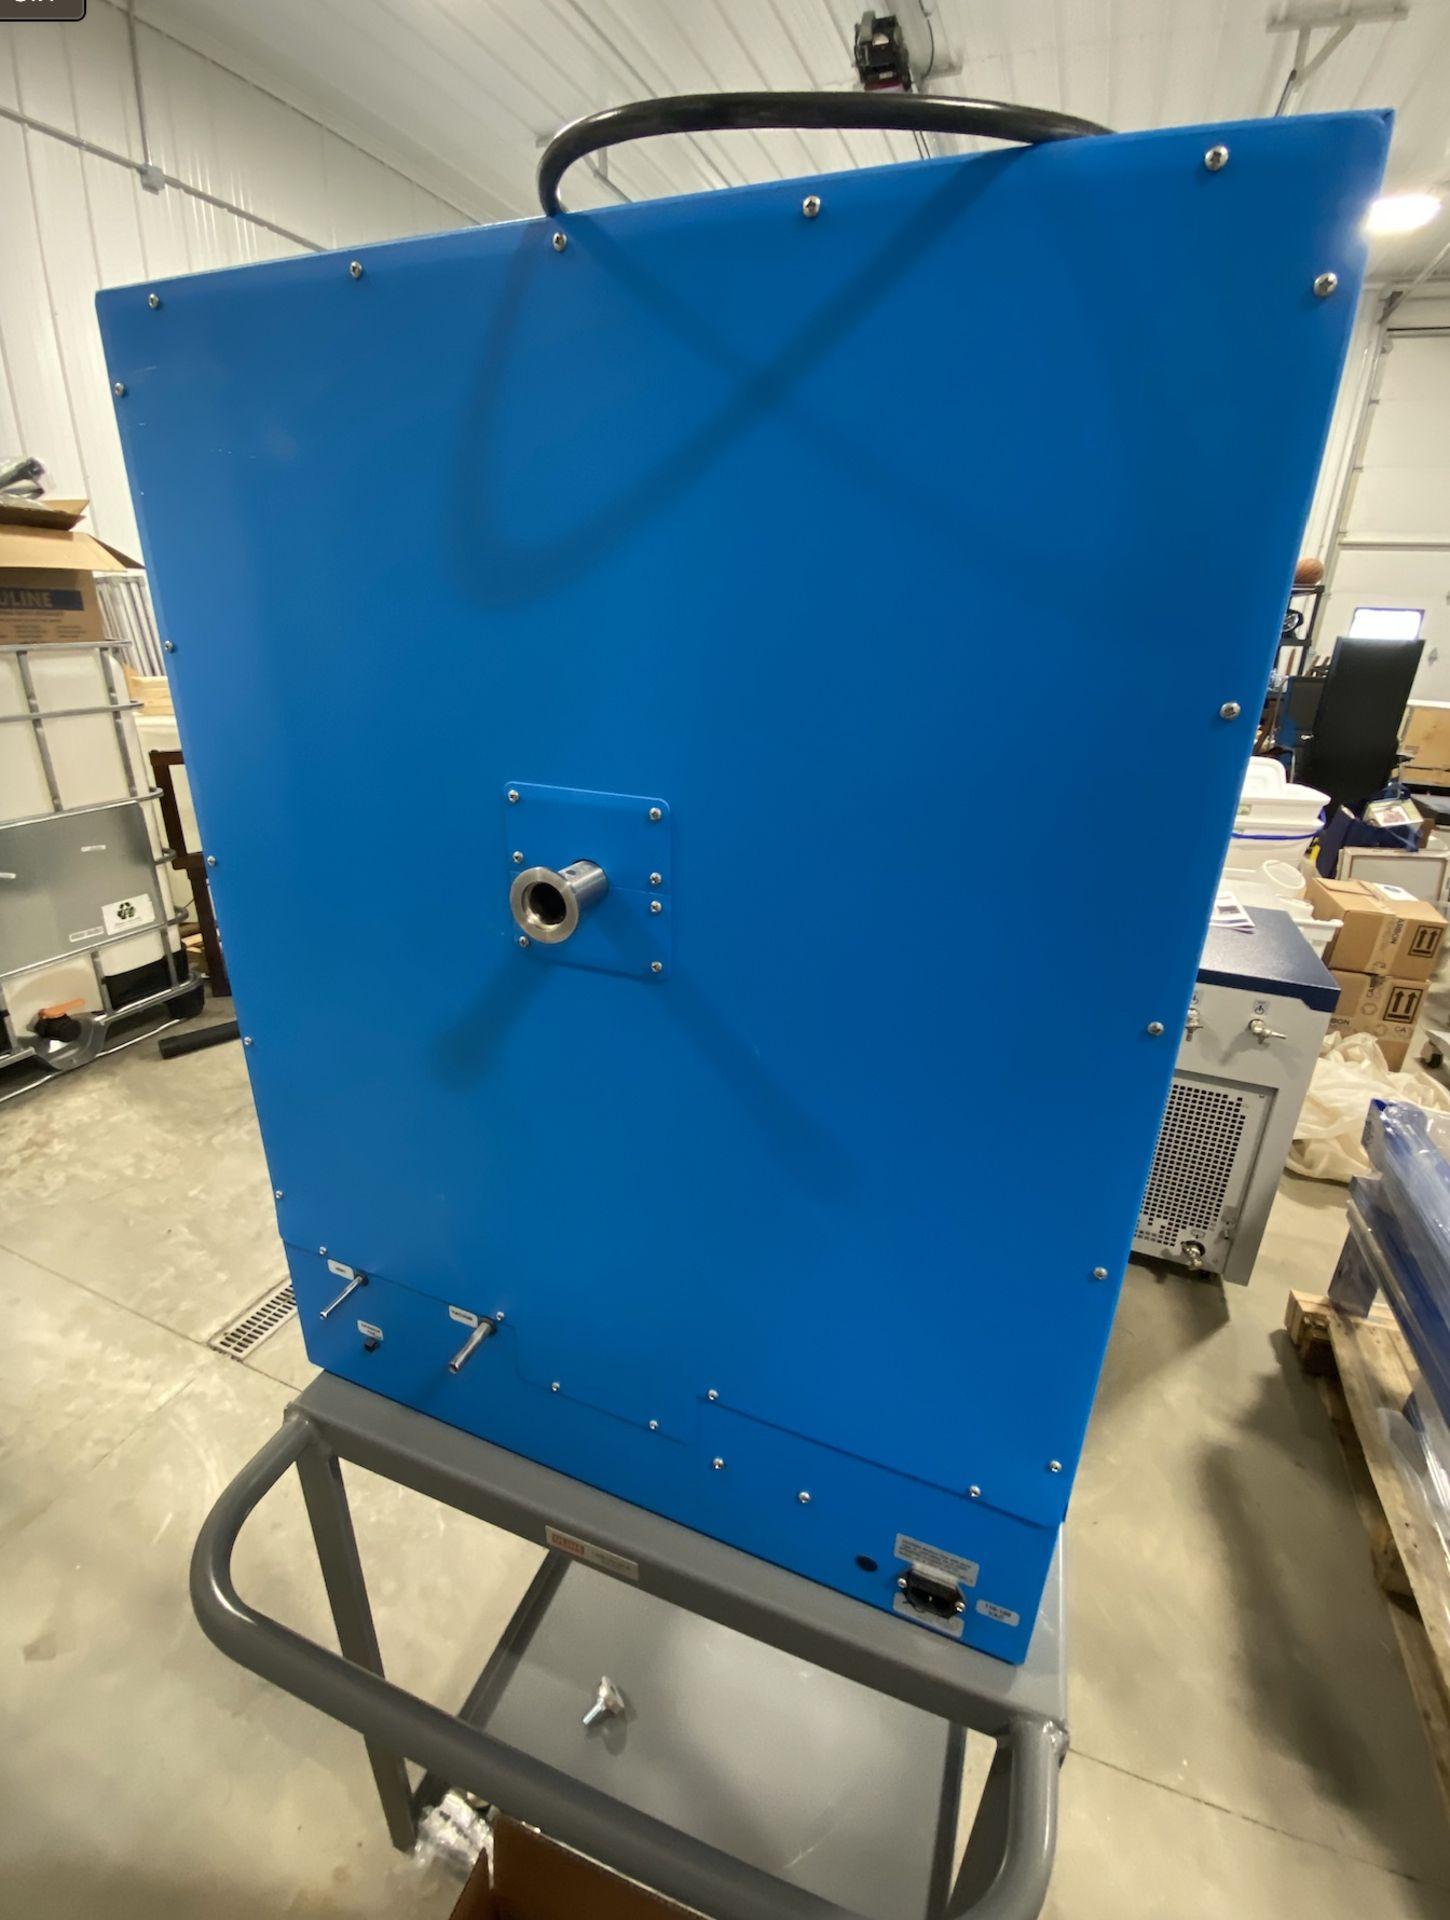 Used Cascade Sciences Standard Package Vacuum Oven. Model CVO-5 w/ Welch Vacuum Pump (2052C-02) - Image 2 of 4